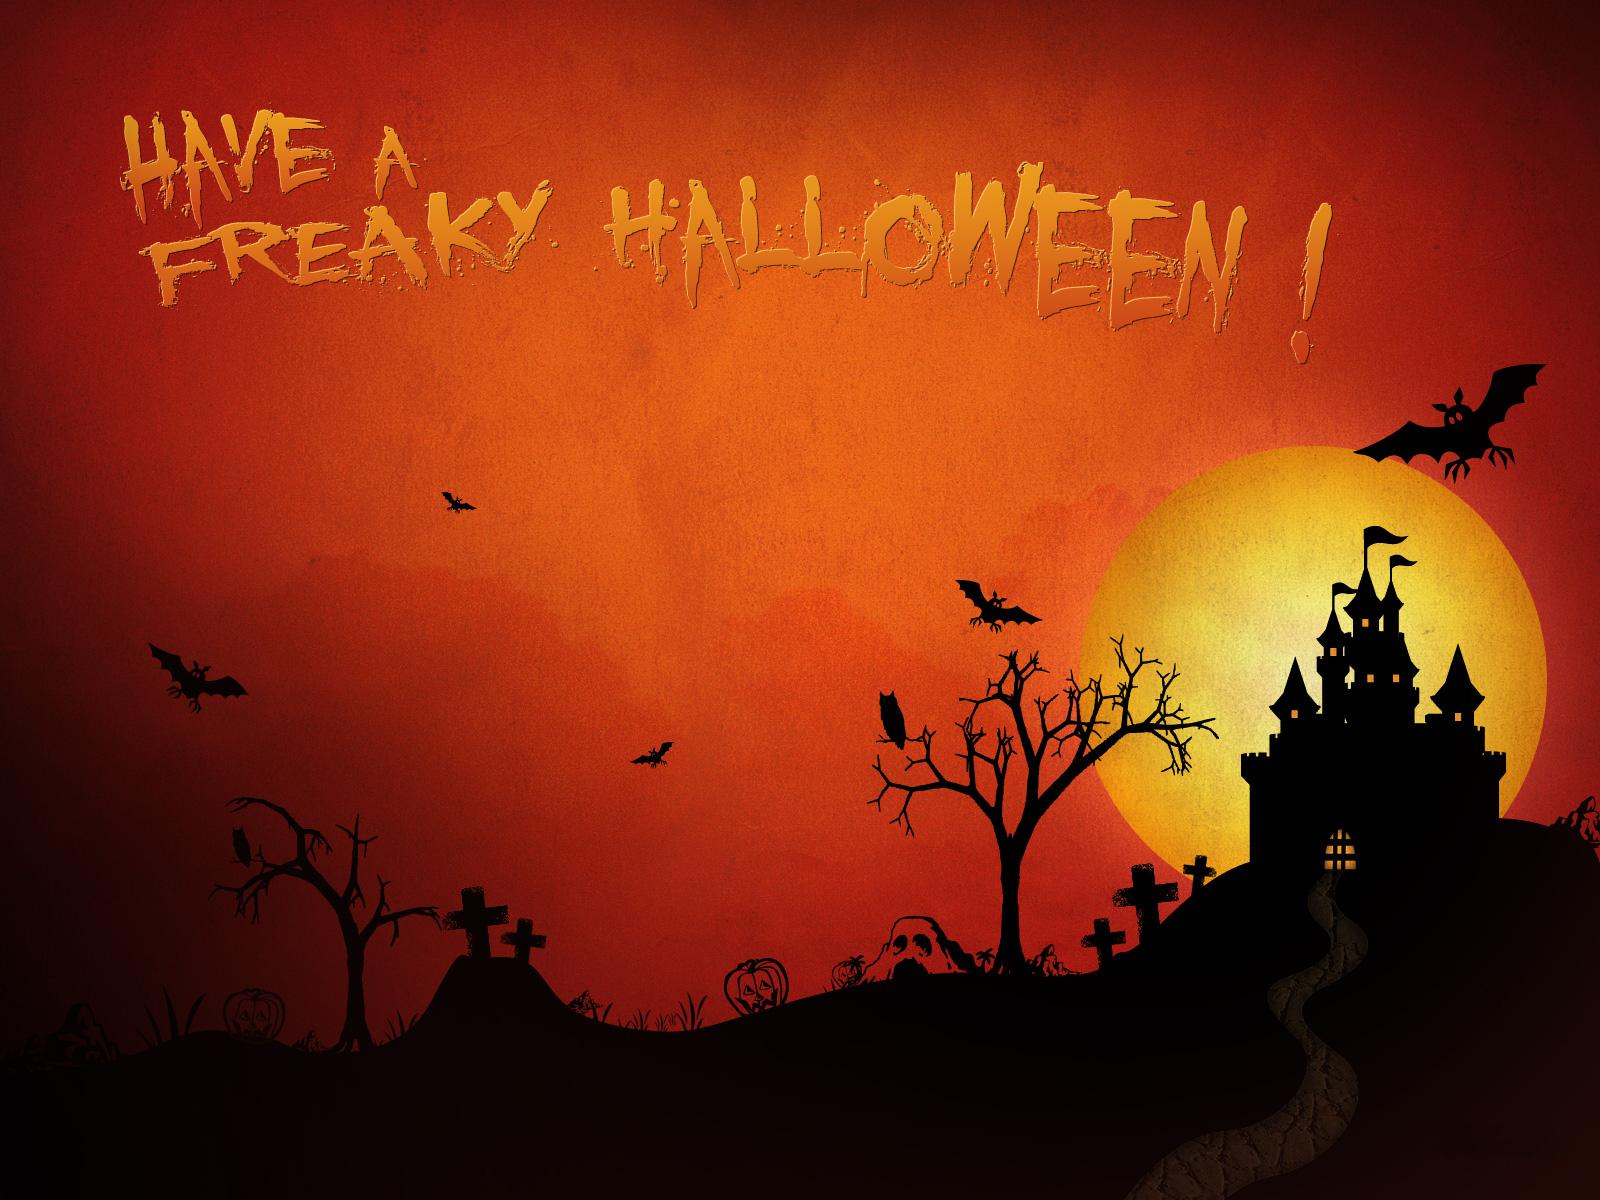 halloween desktop wallpaper   wwwwallpapers in hdcom 1600x1200